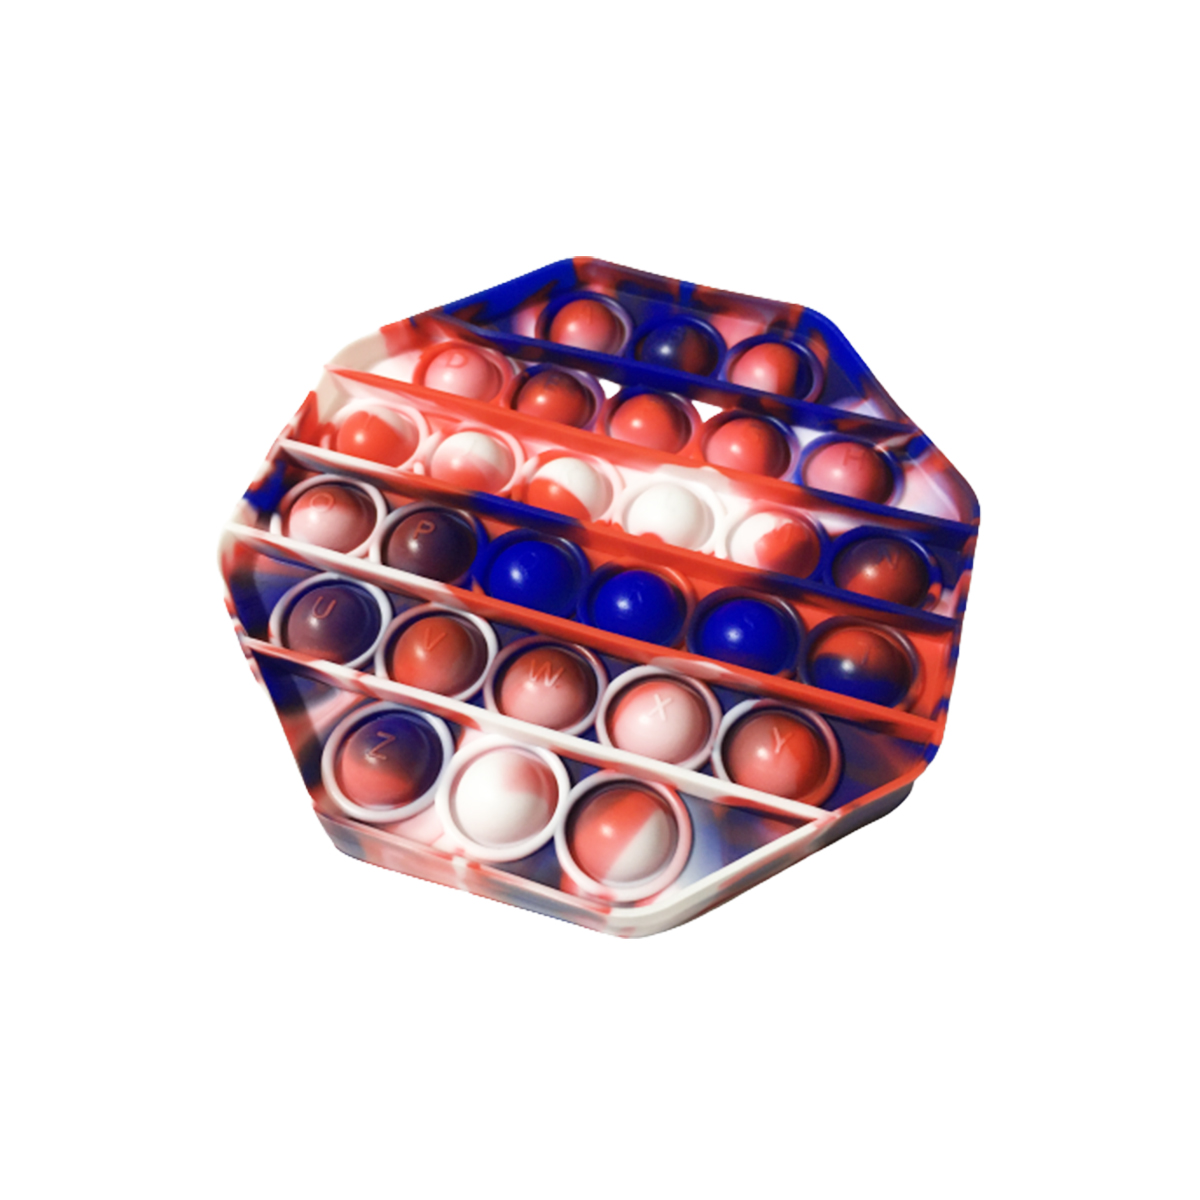 Brinquedo Anti Stress Ansiedade Alívio Pop It Fidget Colorido